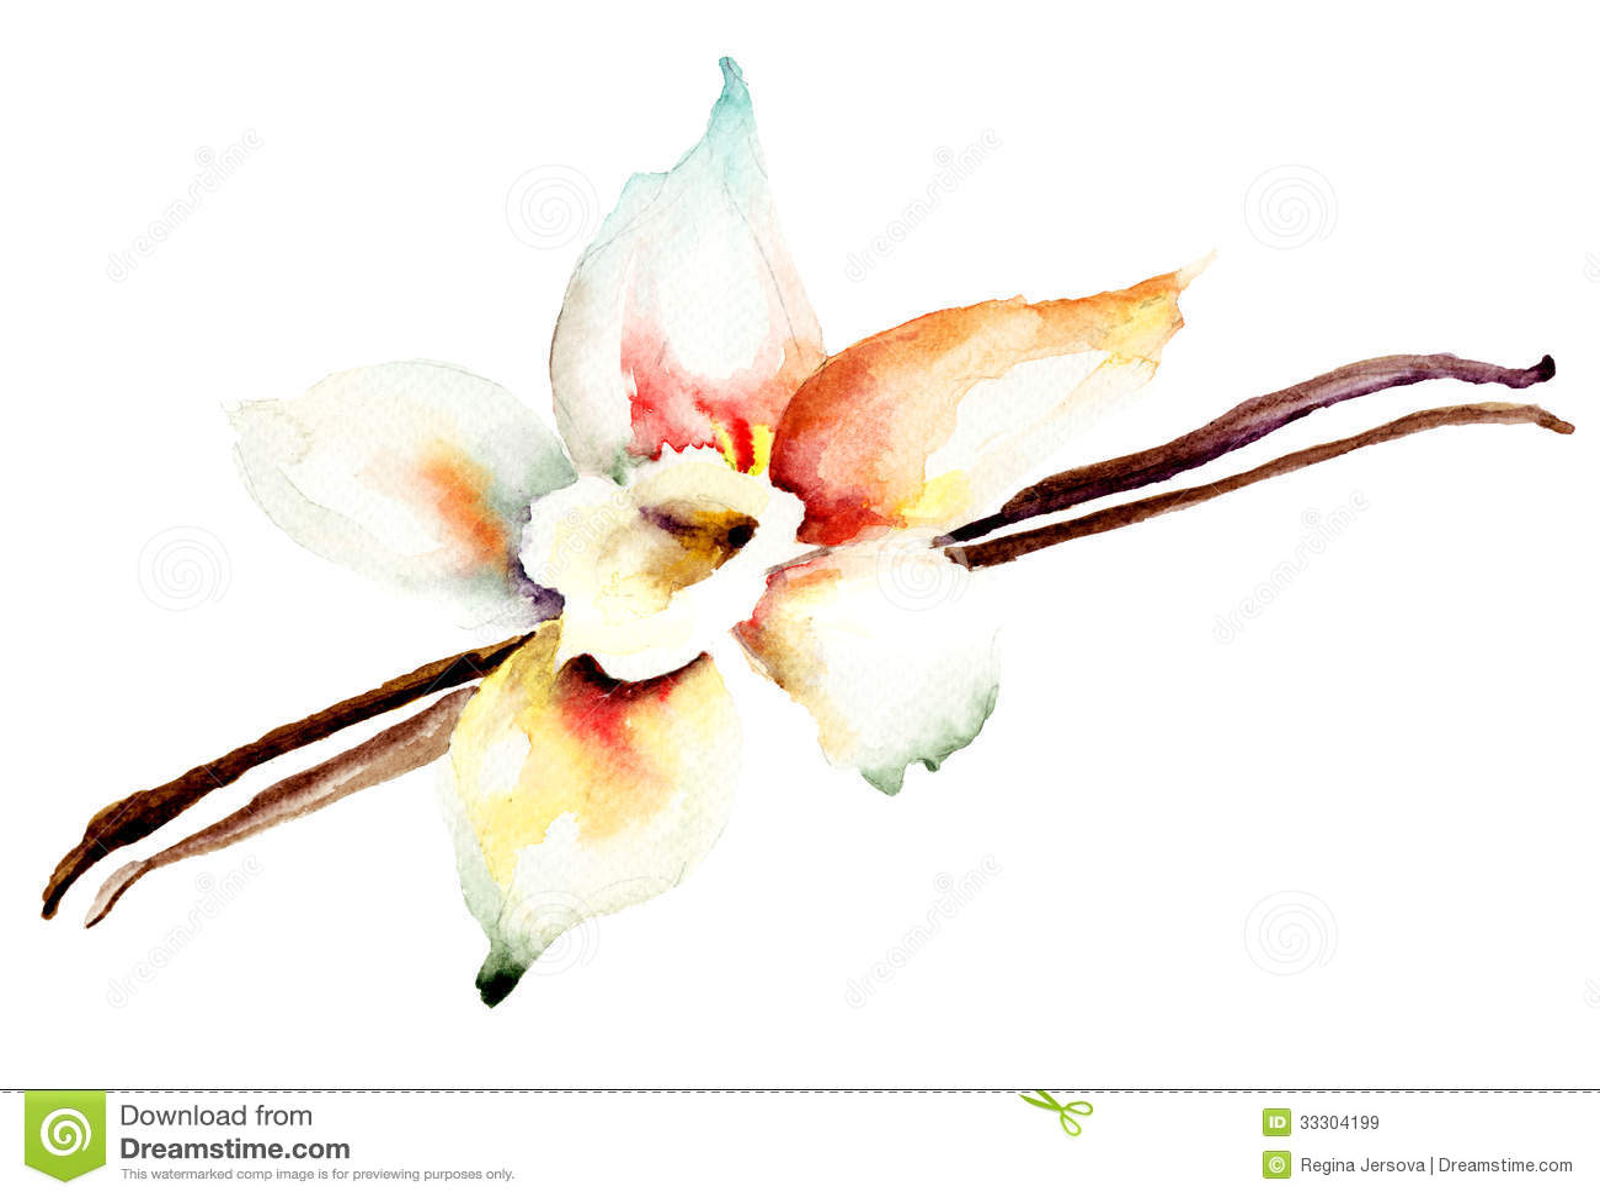 Vanilla Pods And Flower Stock Illustration. Image Of Stick